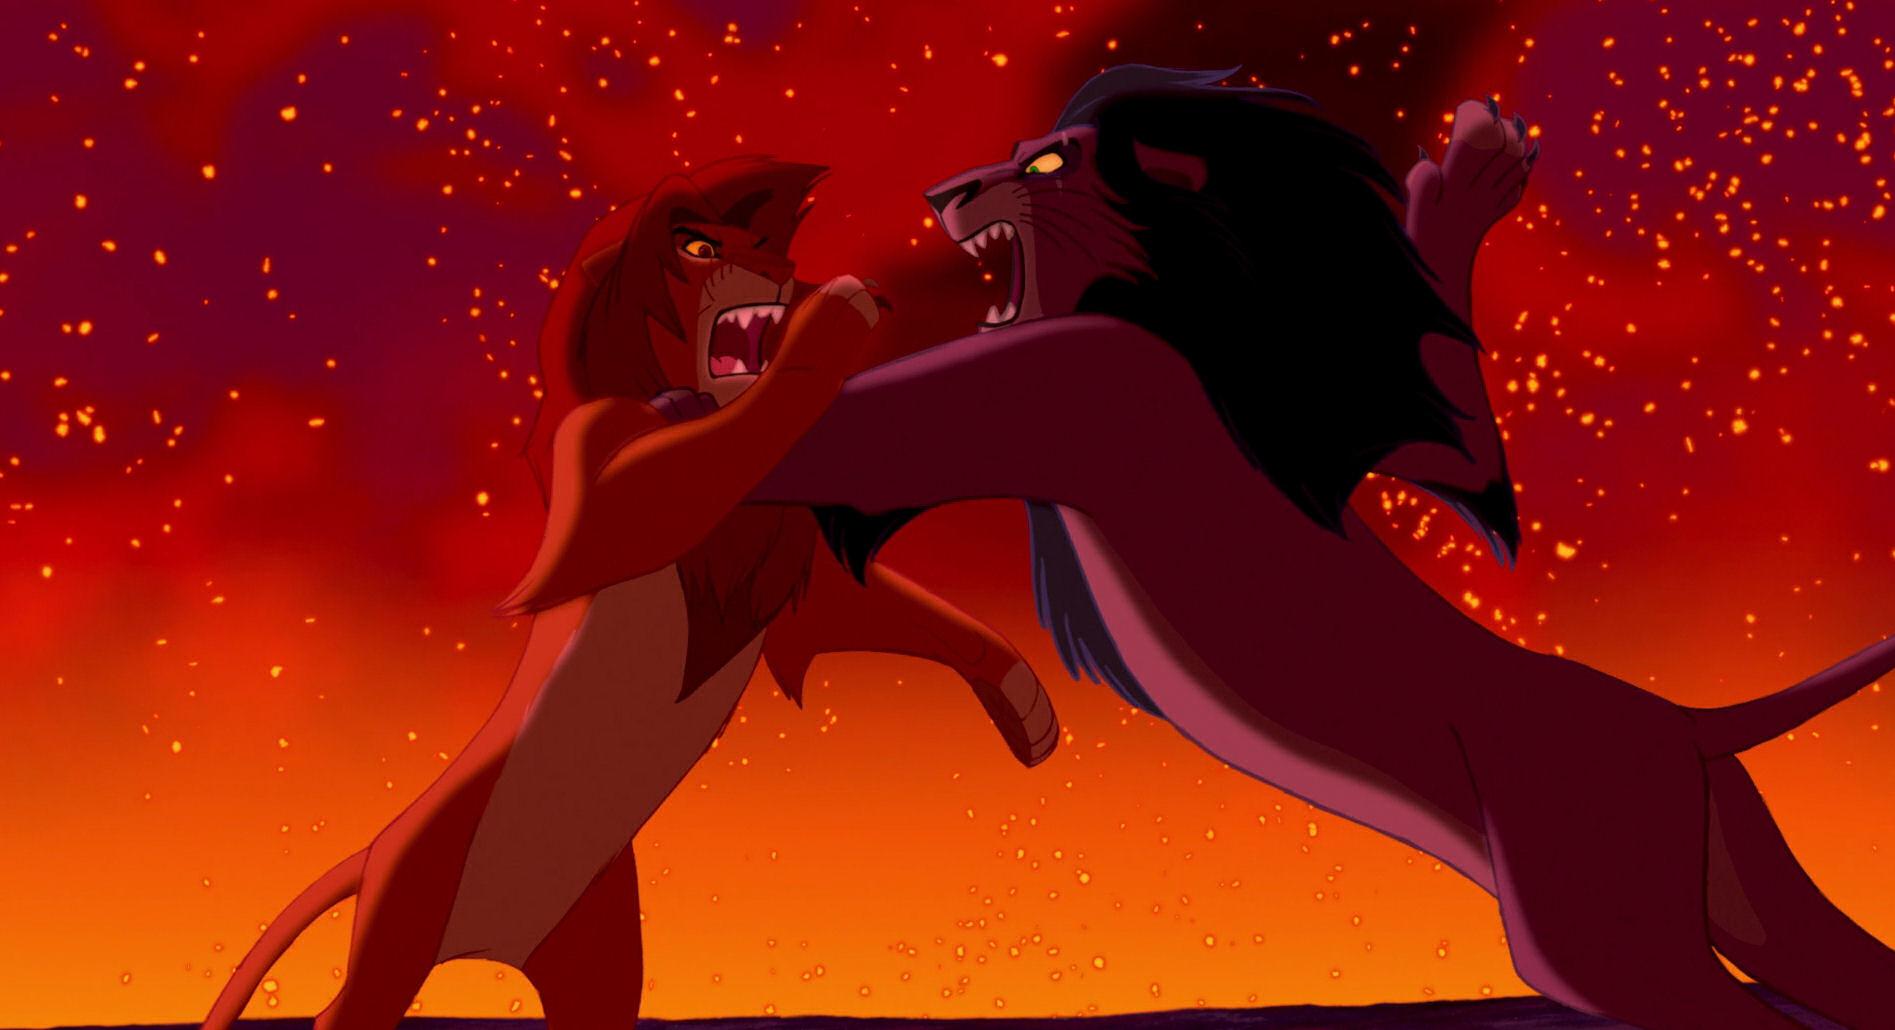 Movies, Scar, Simba, The Lion King, Wallpaper, Wallpapers - Lion King Scar Vs Simba , HD Wallpaper & Backgrounds